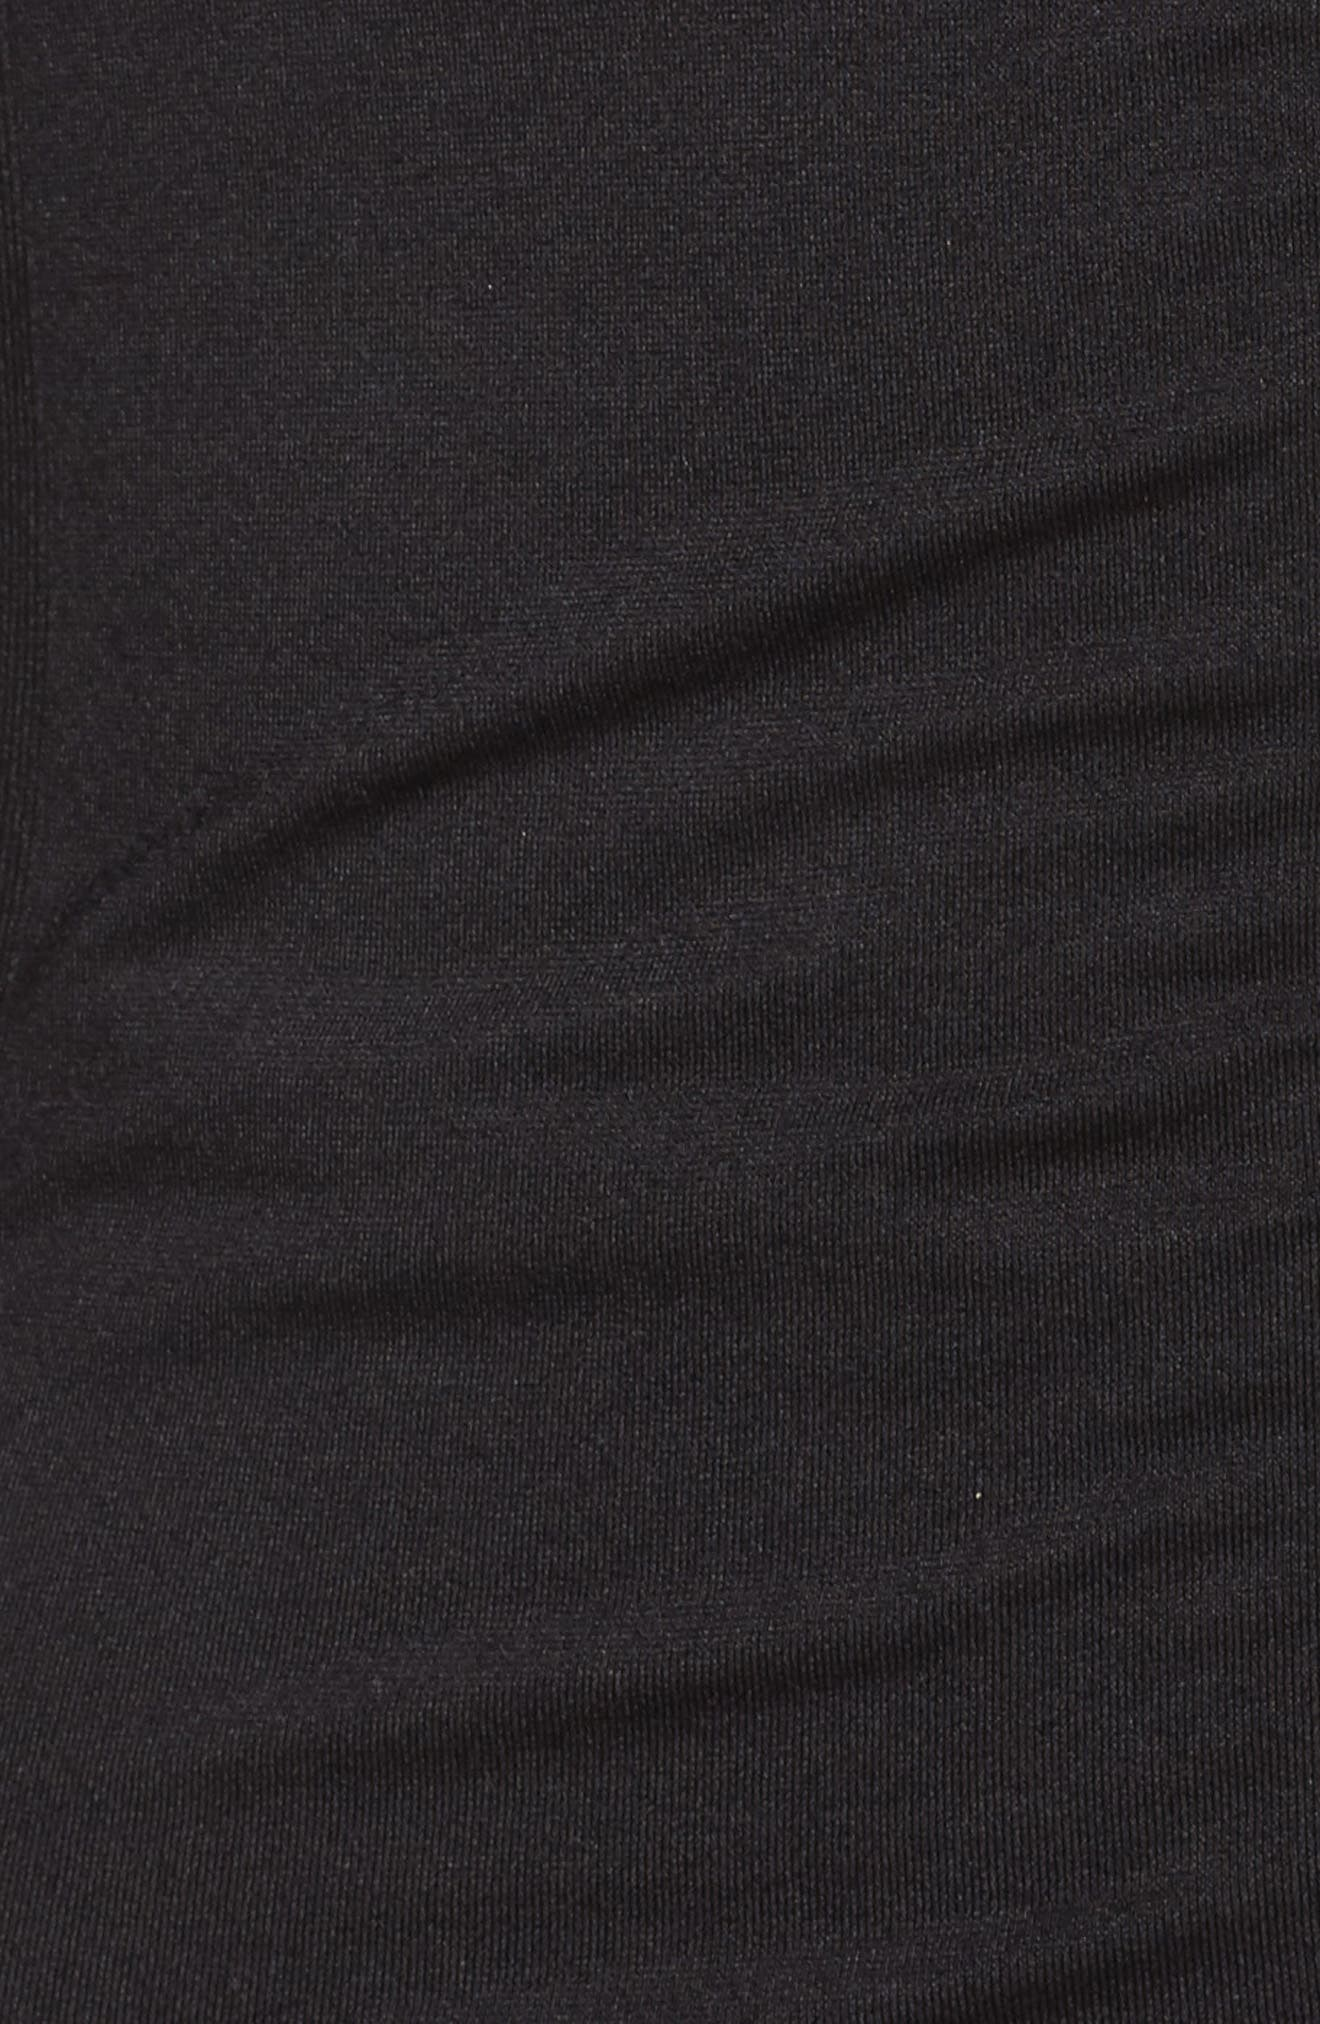 Finish Line Jacket,                             Alternate thumbnail 6, color,                             Solid Black